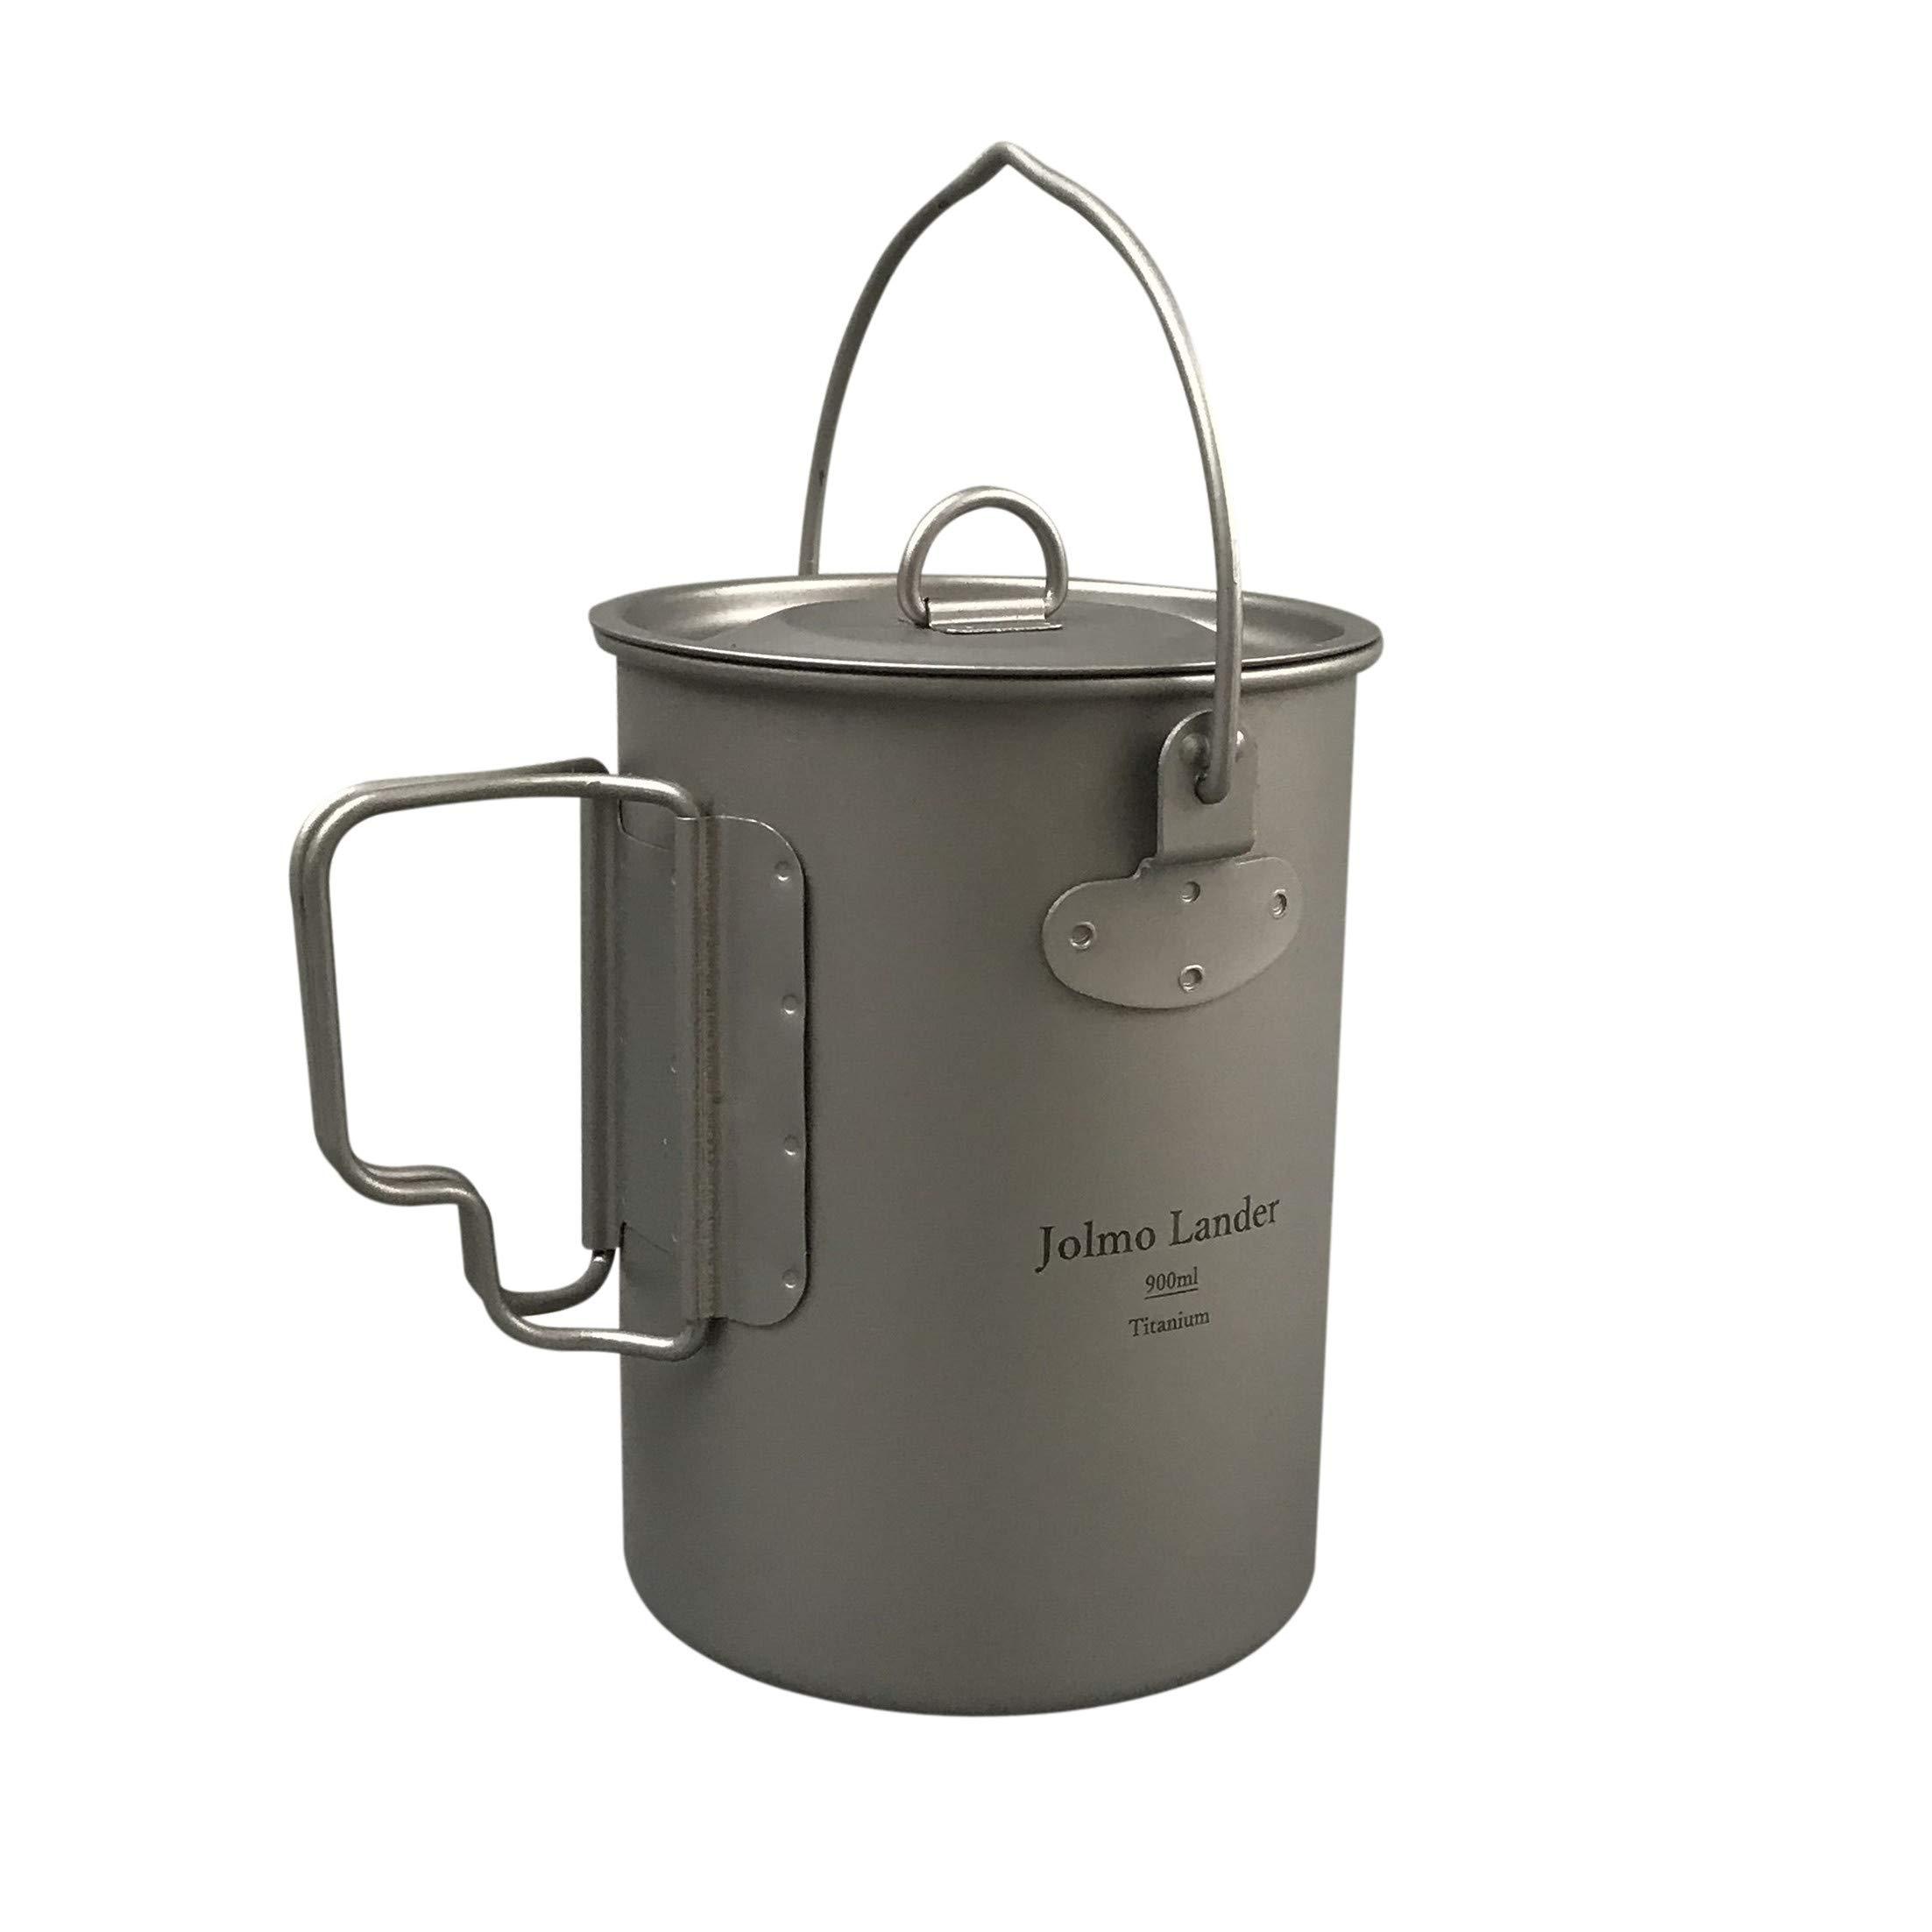 Jolmo Lander Titanium Pot with Bail Handle Outdoor Ultralight Titanium Cookware 900ml by Jolmo Lander